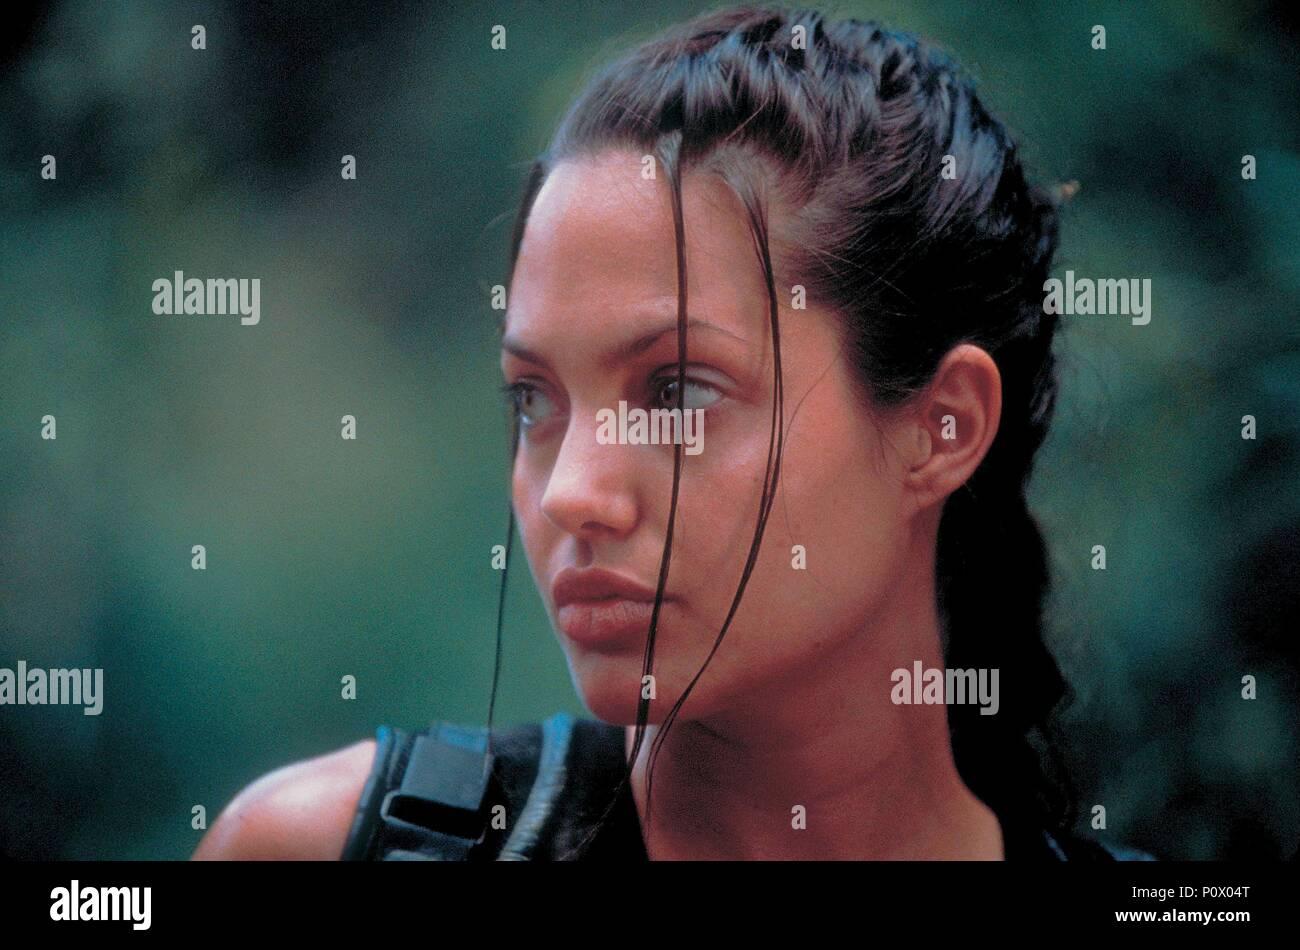 Original Film Title: LARA CROFT: TOMB RAIDER.  English Title: LARA CROFT: TOMB RAIDER.  Film Director: SIMON WEST.  Year: 2001.  Stars: ANGELINA JOLIE. Credit: PARAMOUNT PICTURES / Album - Stock Image